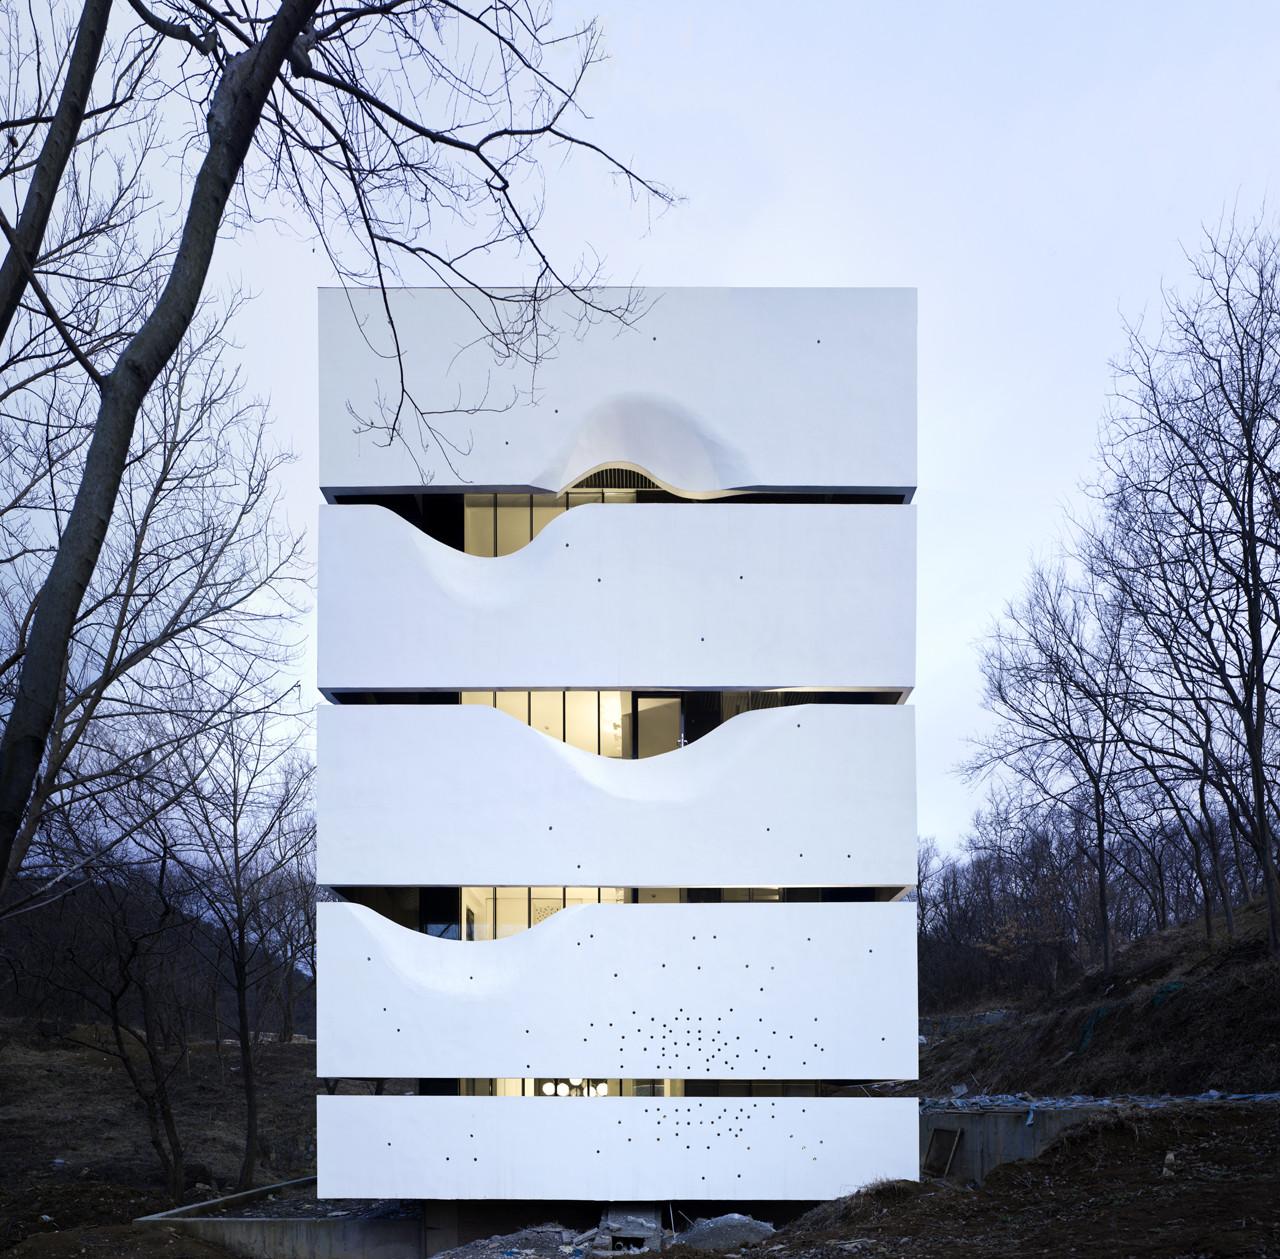 CIPEA Casa No.4 / AZL architects